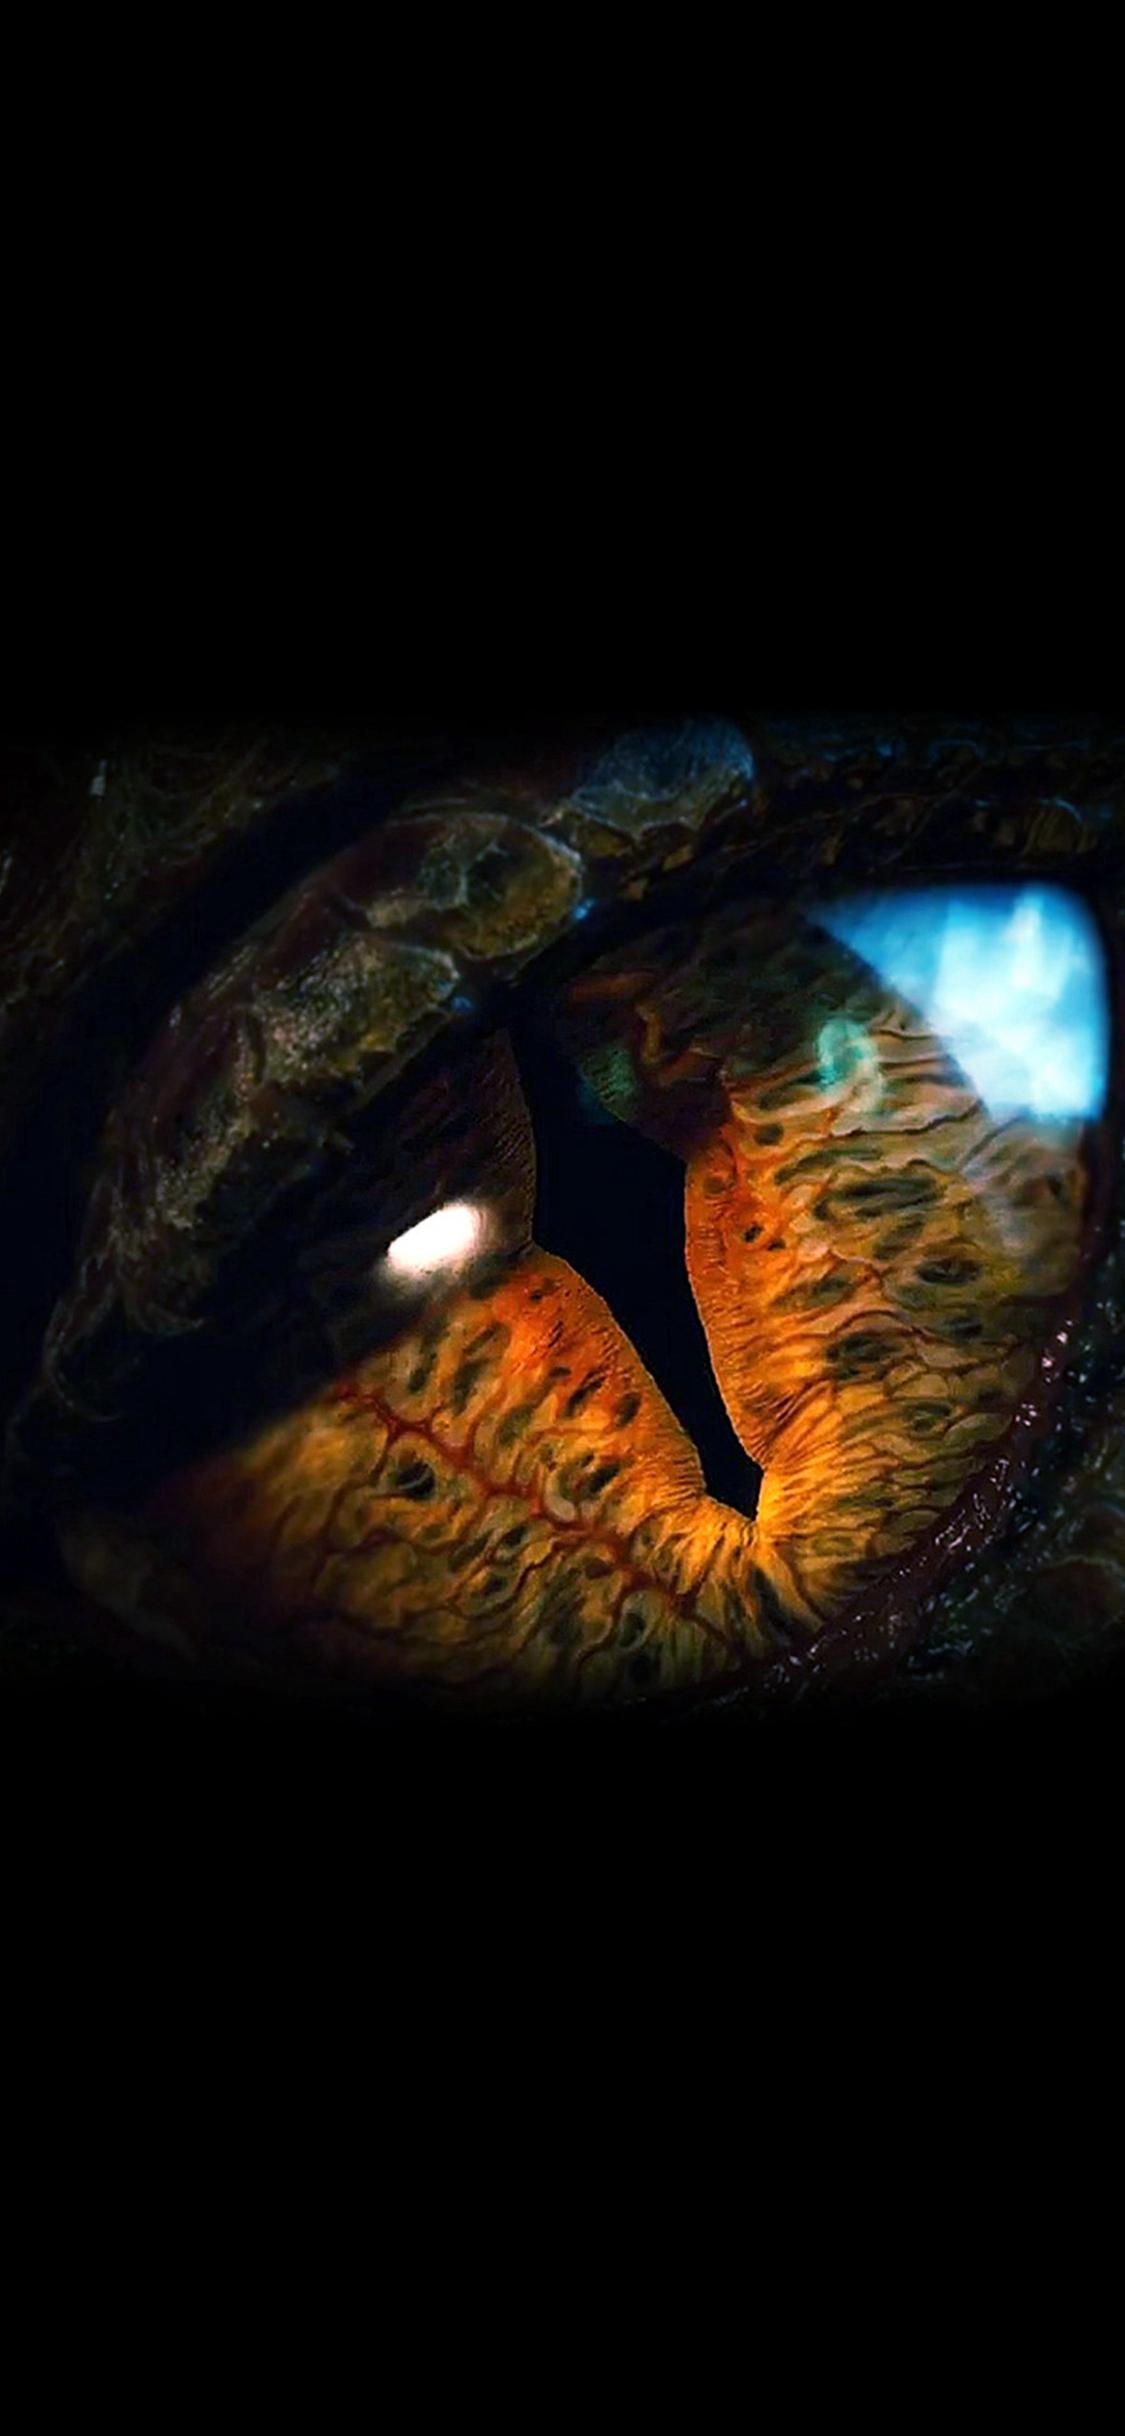 Eye Dragon Film Hobbit The Battle Five Armies Art Dark